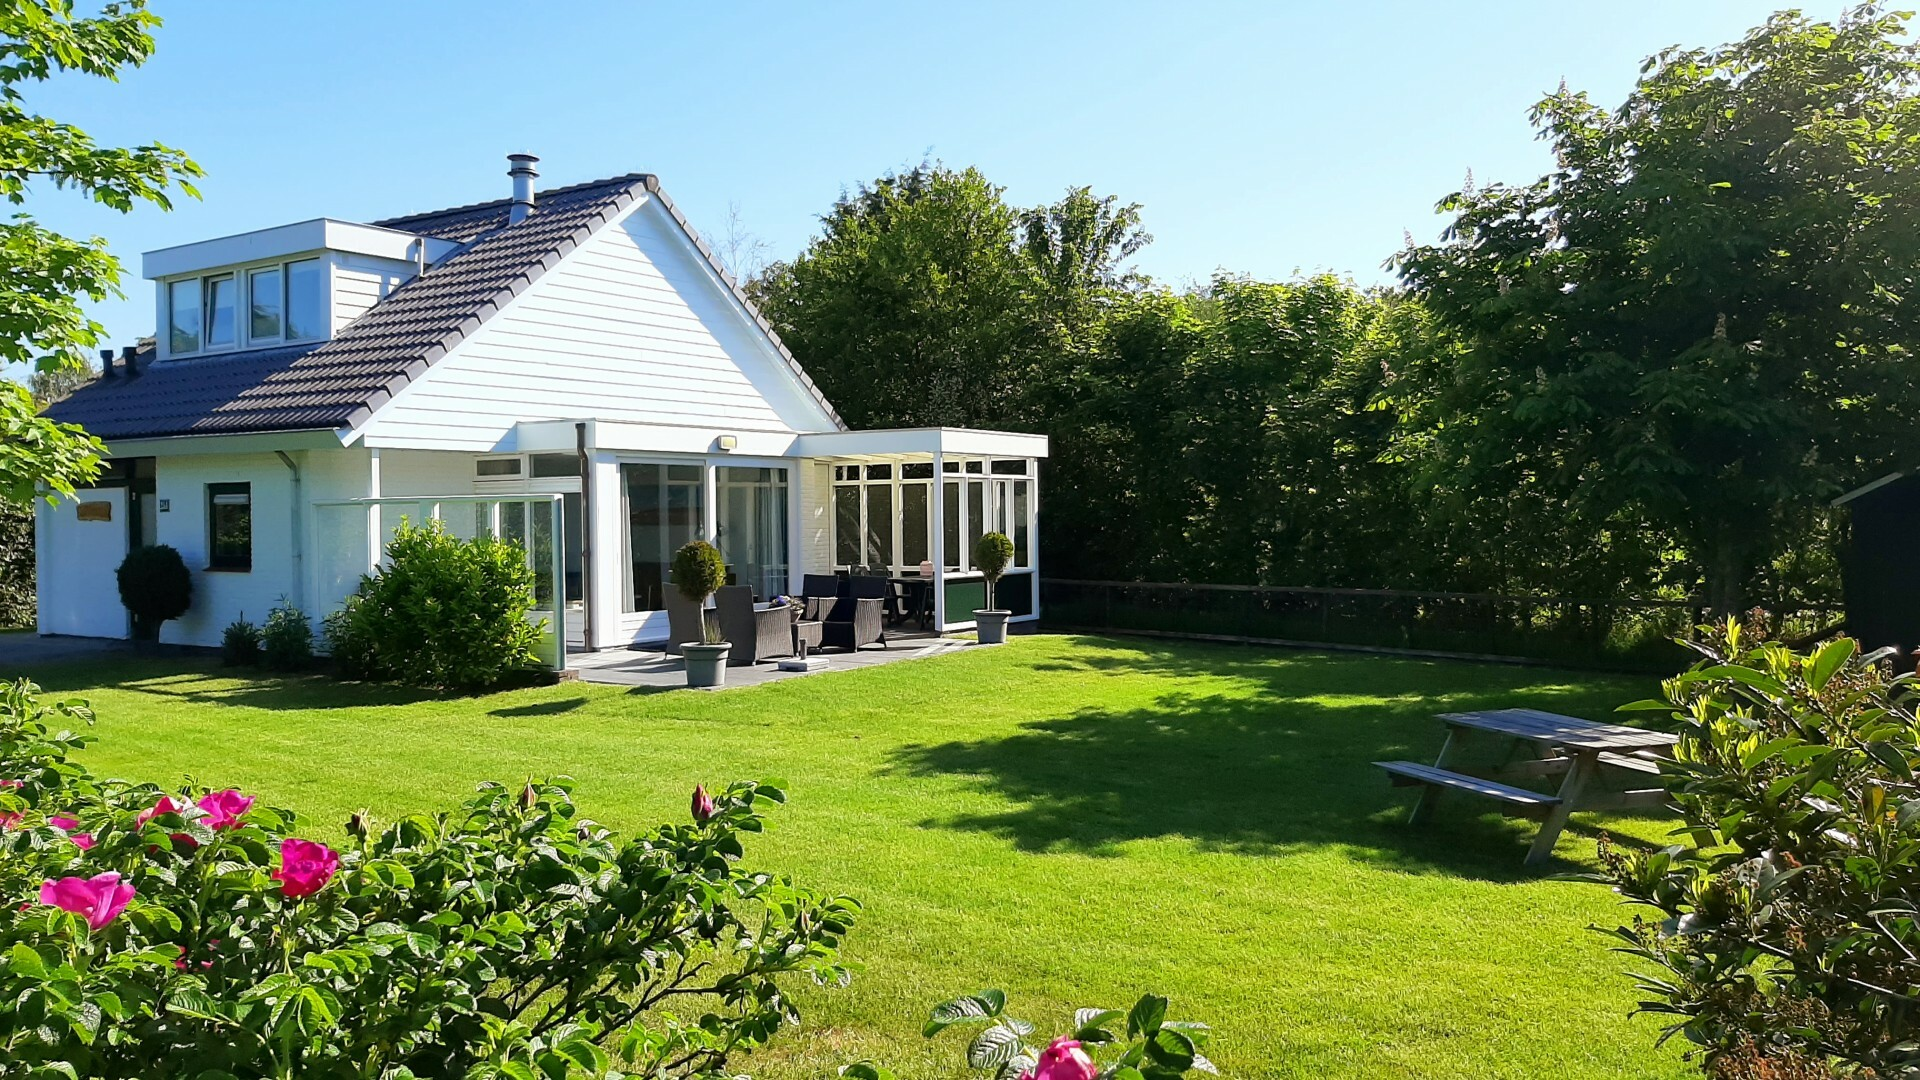 Bungalowpark De Parel tuin VVV Texel